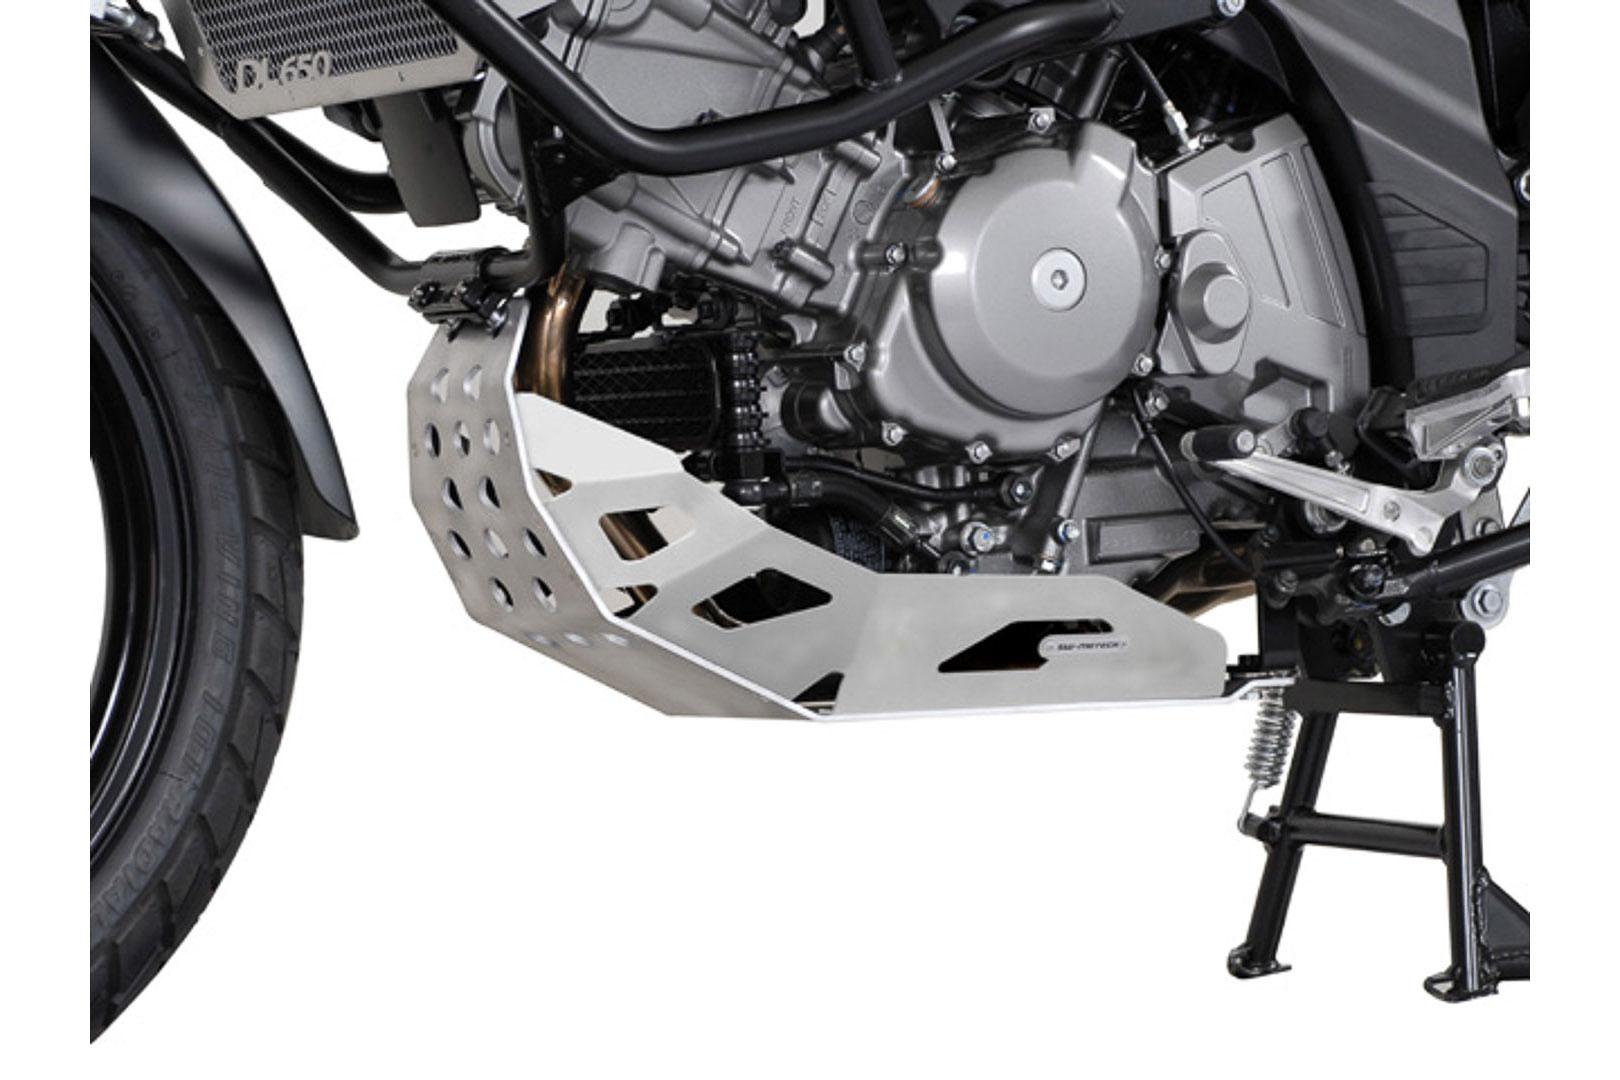 SW-Motech Pohjapanssari Suzuki DL650 V-Strom hopea